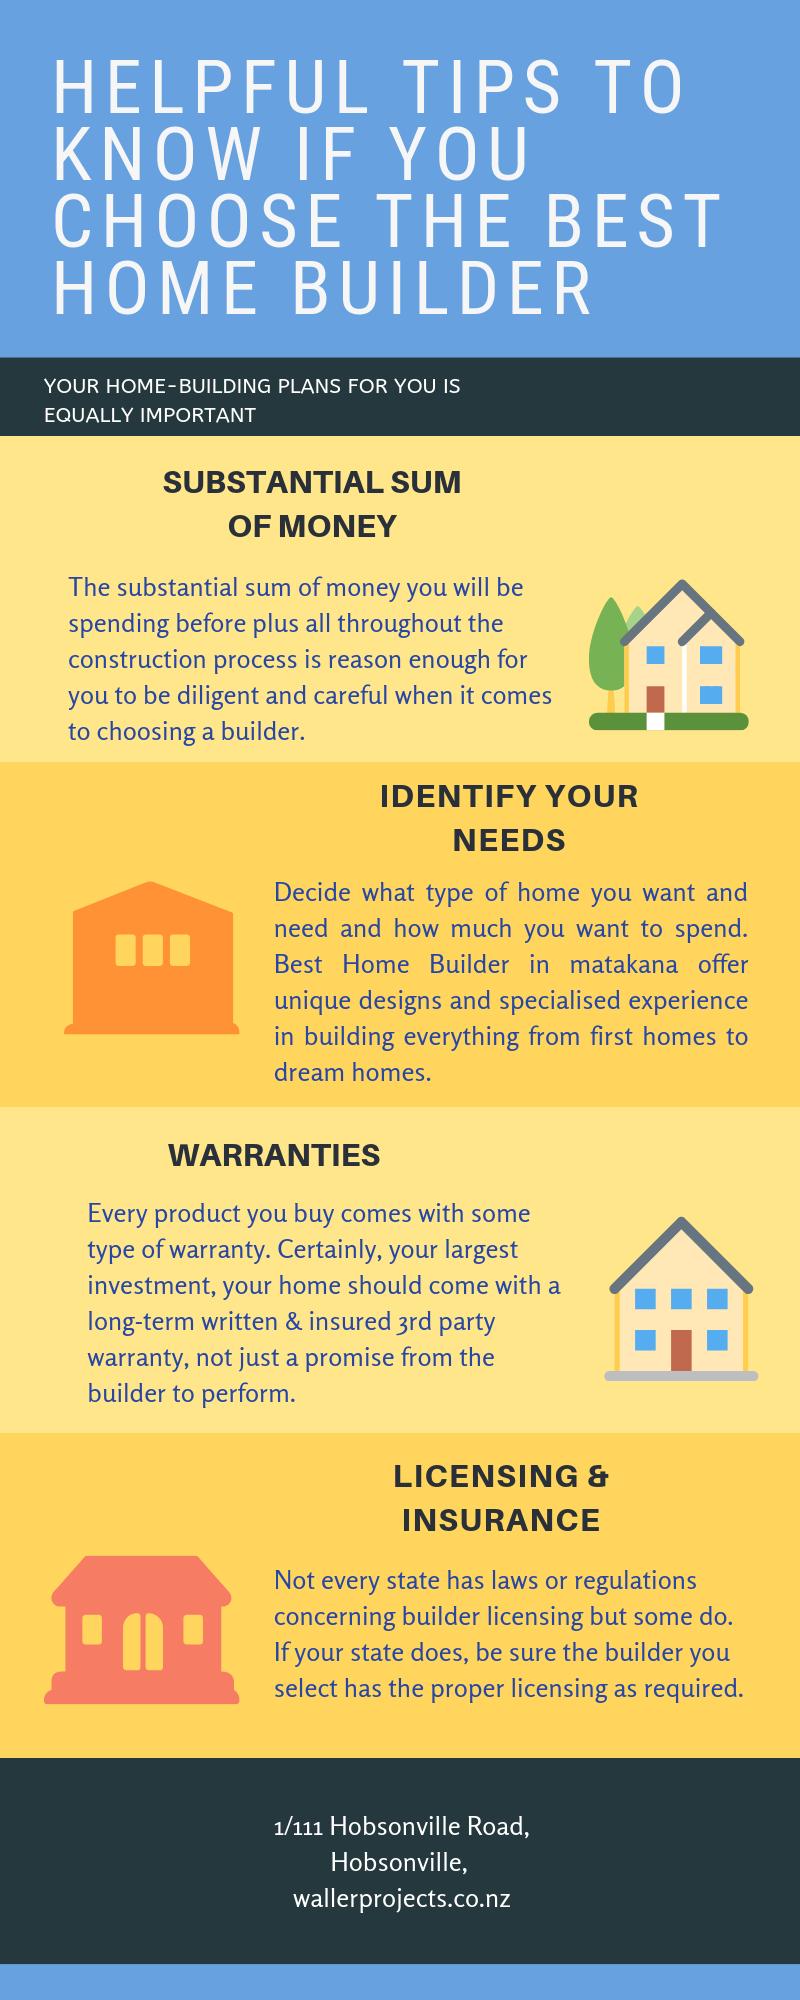 Matakana Home Builder Best Home Builders Home Builders